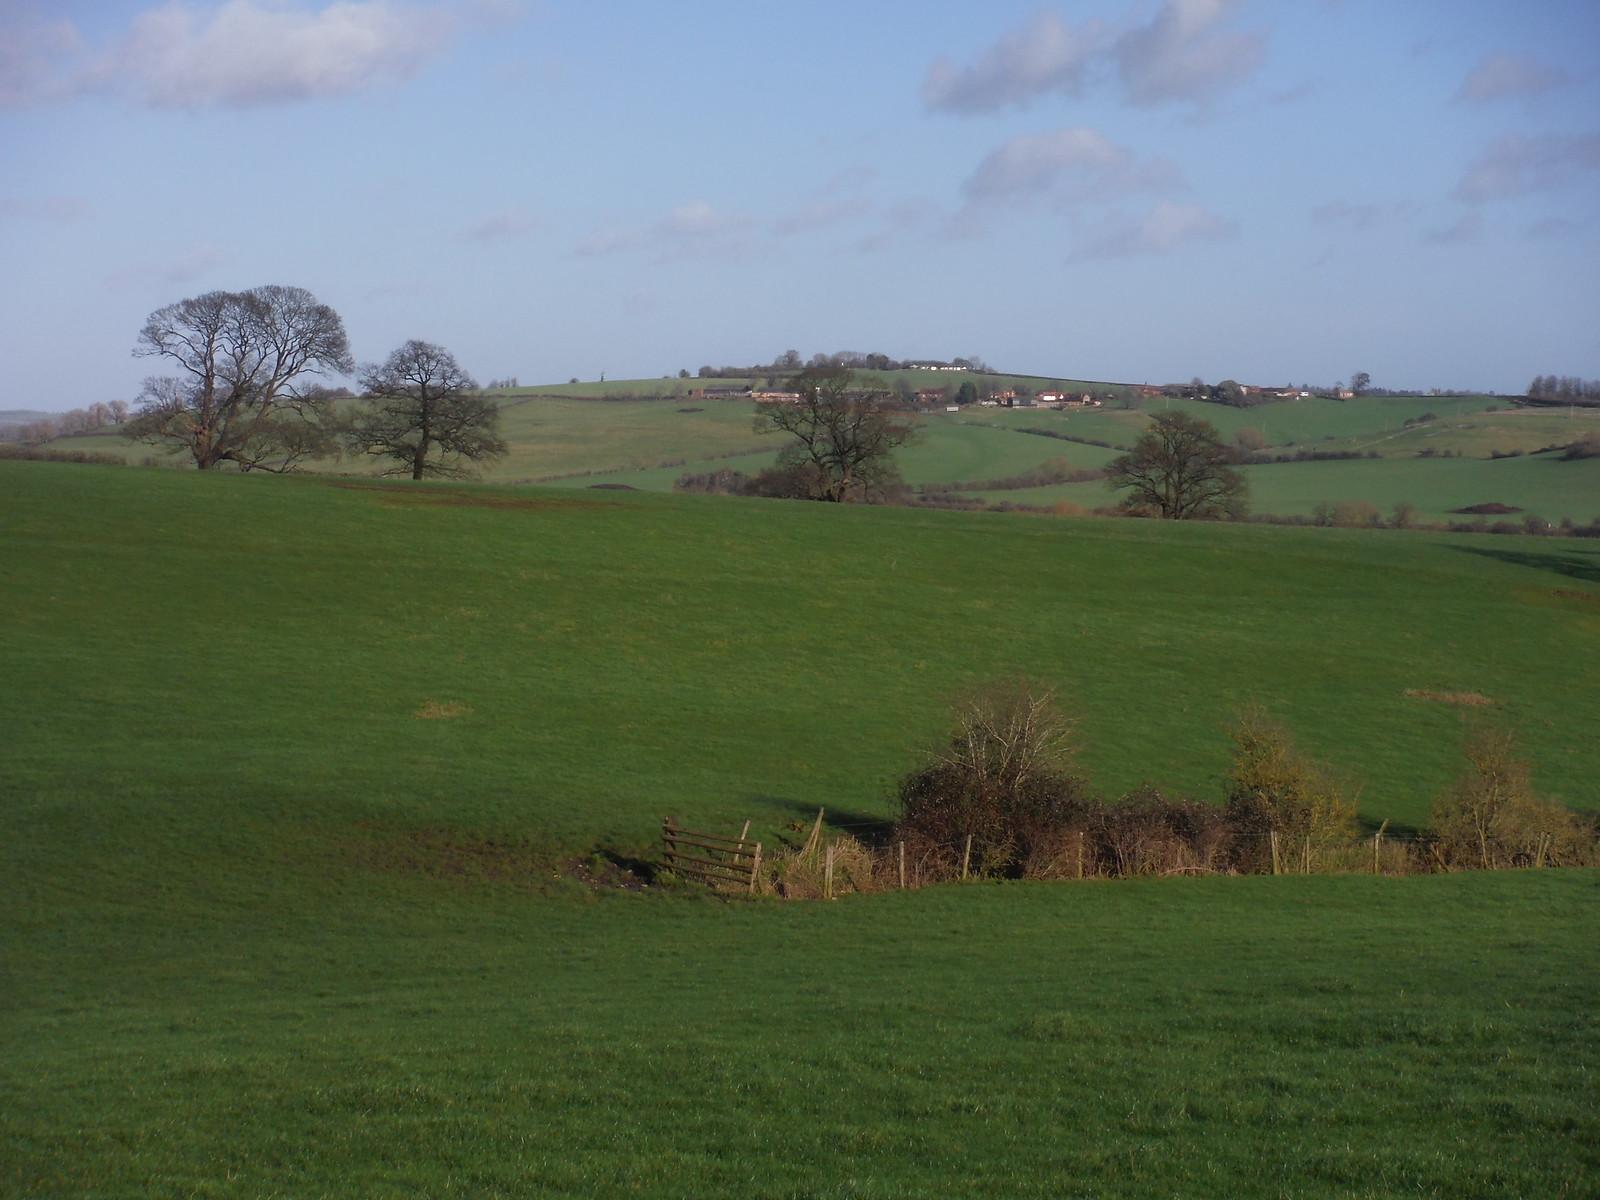 Lower & Upper Pollicott and Ashendon from fields near Chilton House SWC Walk 191a Haddenham Circular (w/o Brill)